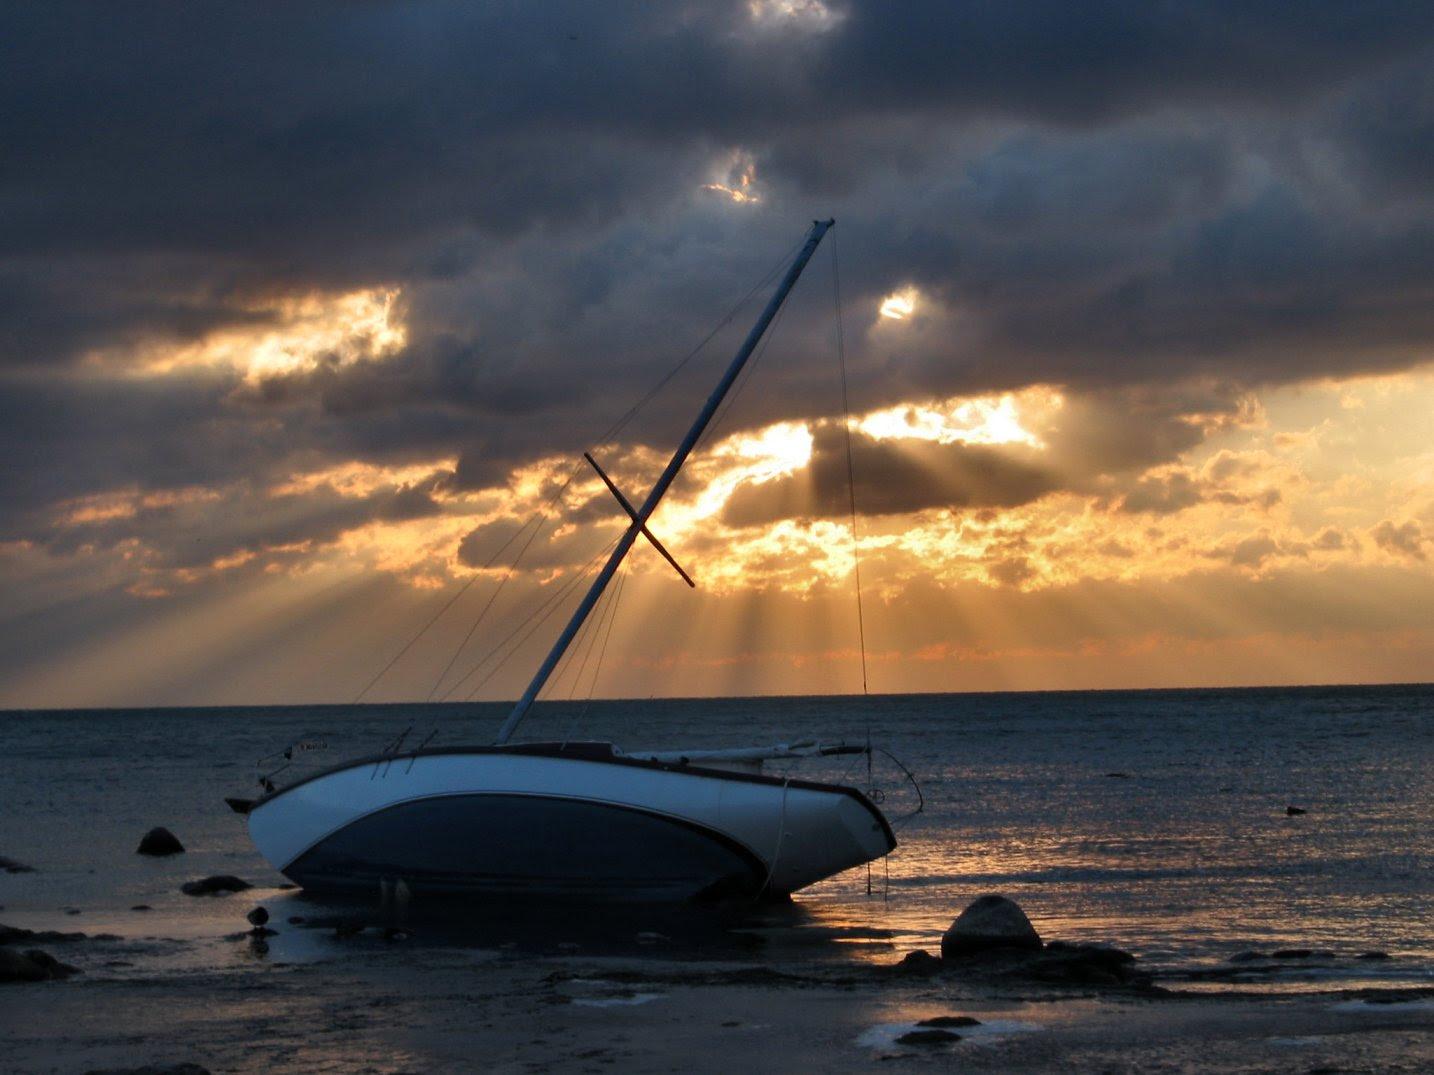 Stranded sailboat above Bradford Beach, in Lake Michigan, Milwaukee, WI - 11-25-2007 - soul-amp.com